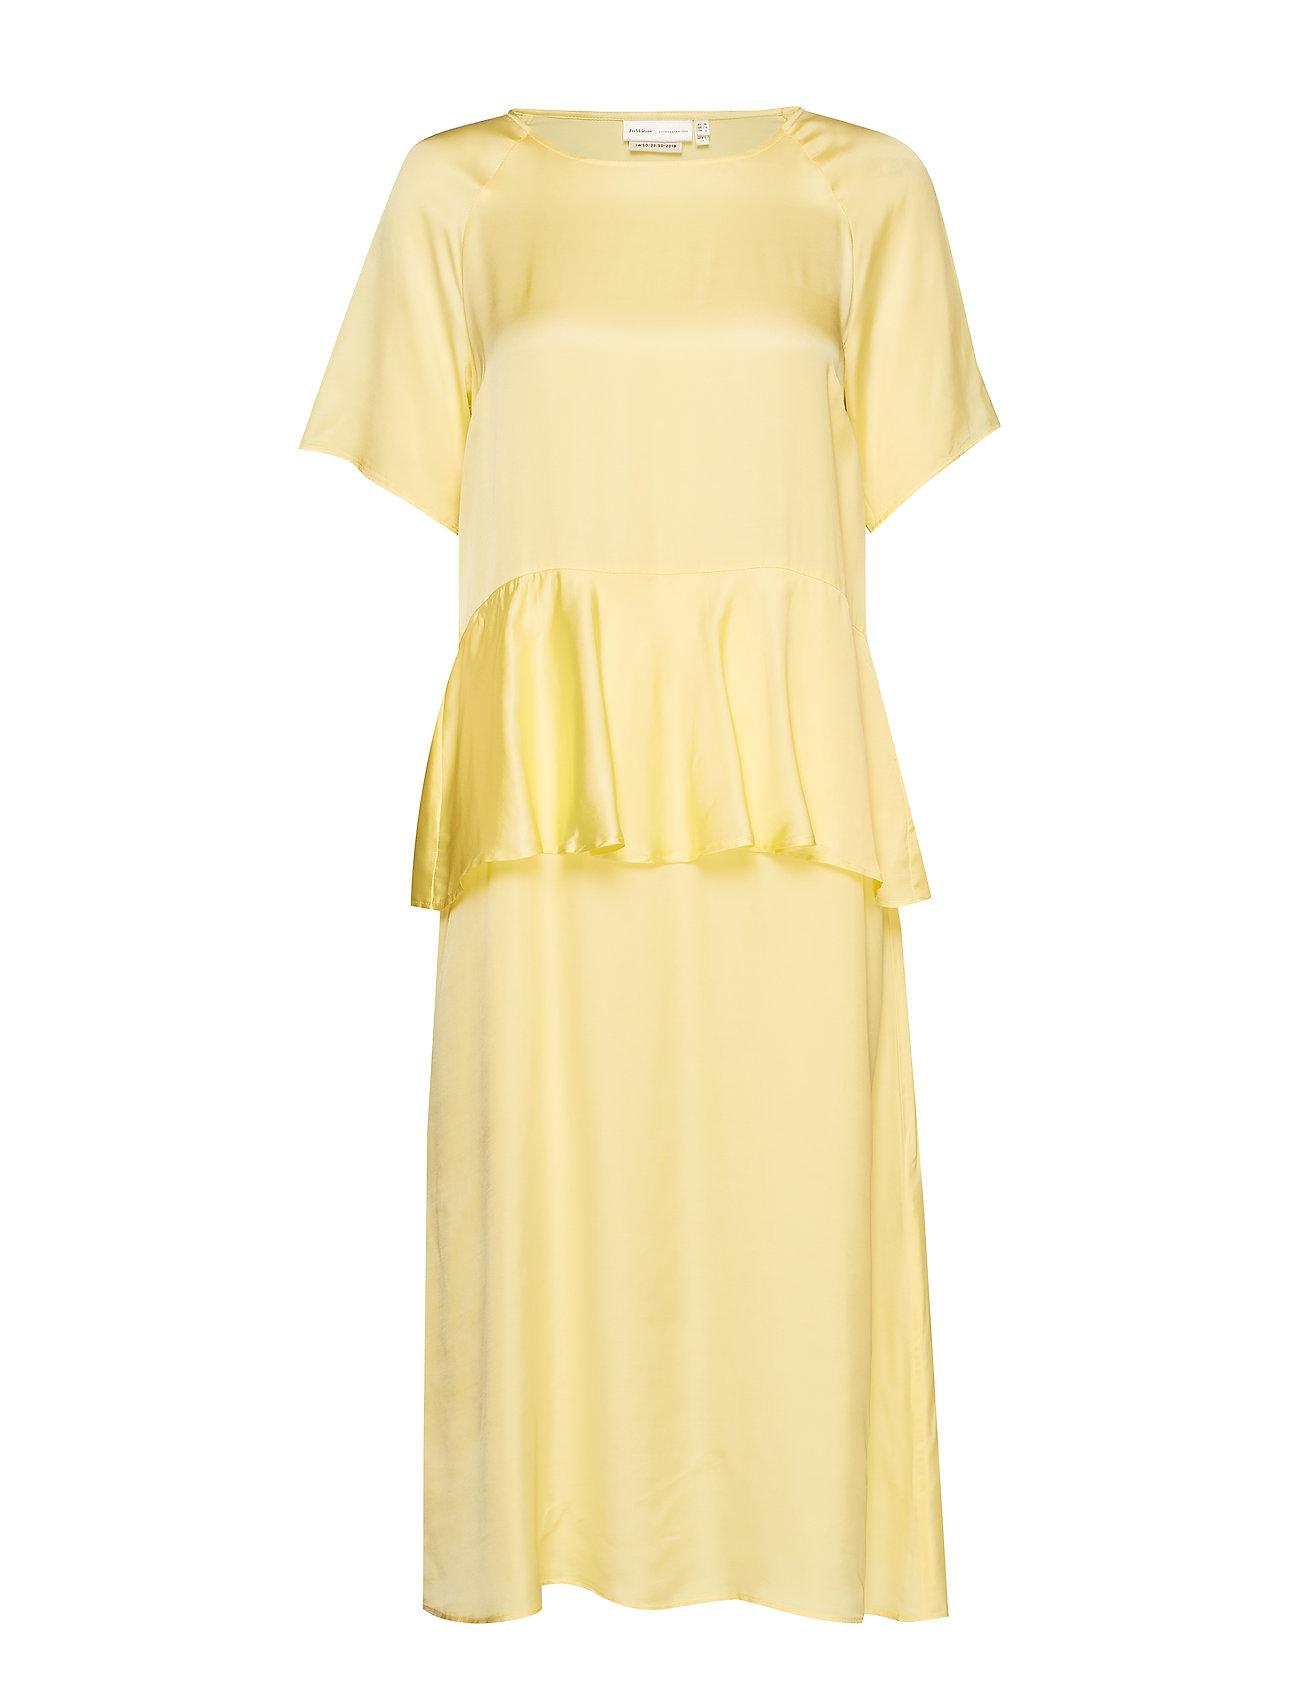 InWear IW50 23 TurlingtonIW Dress